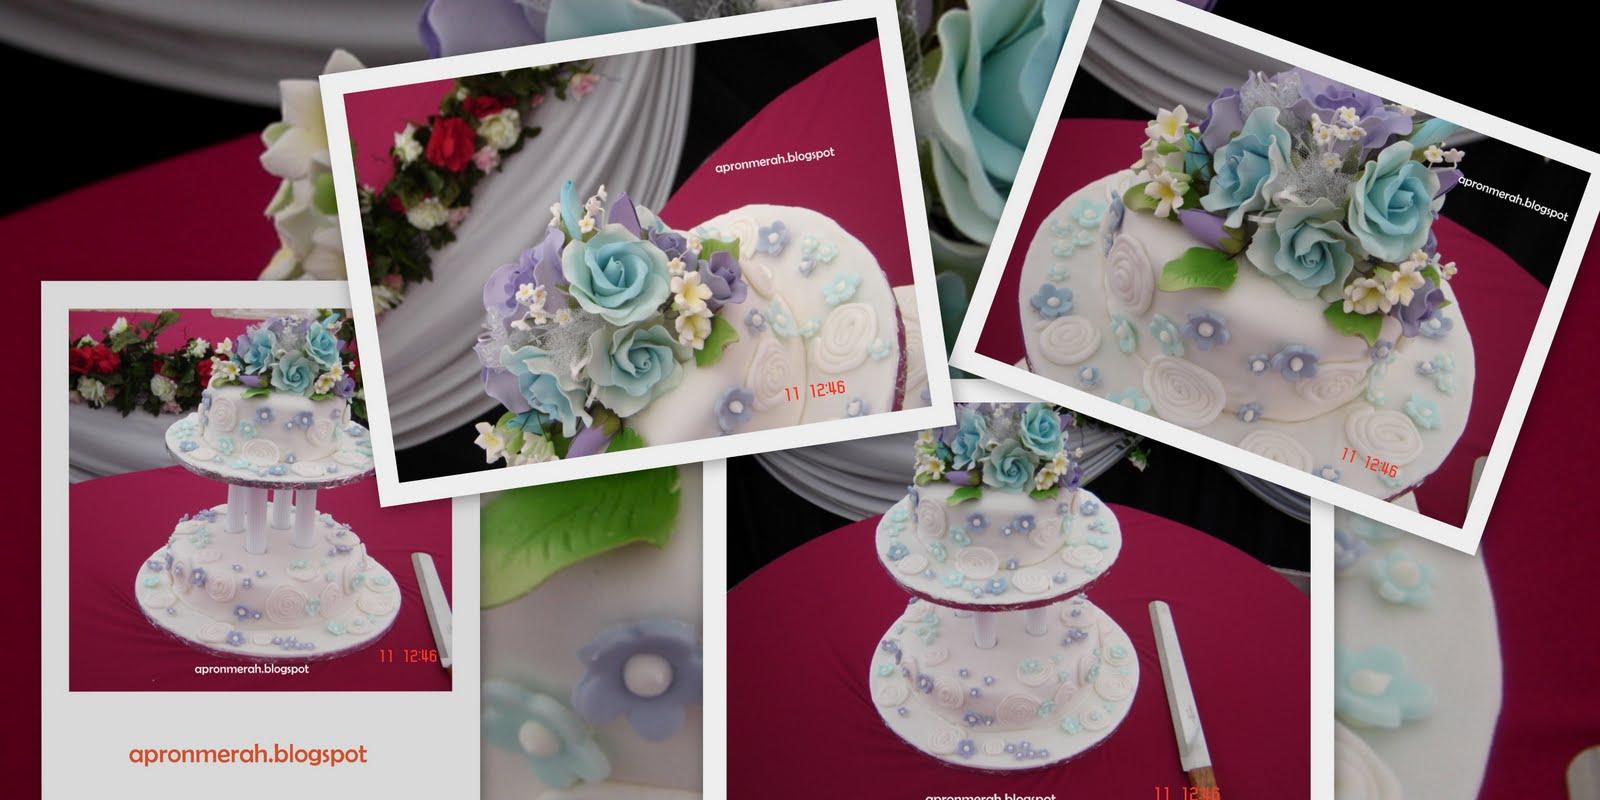 The Red Apron Cakes & Cupcakes Purple & Blue Wedding Cake